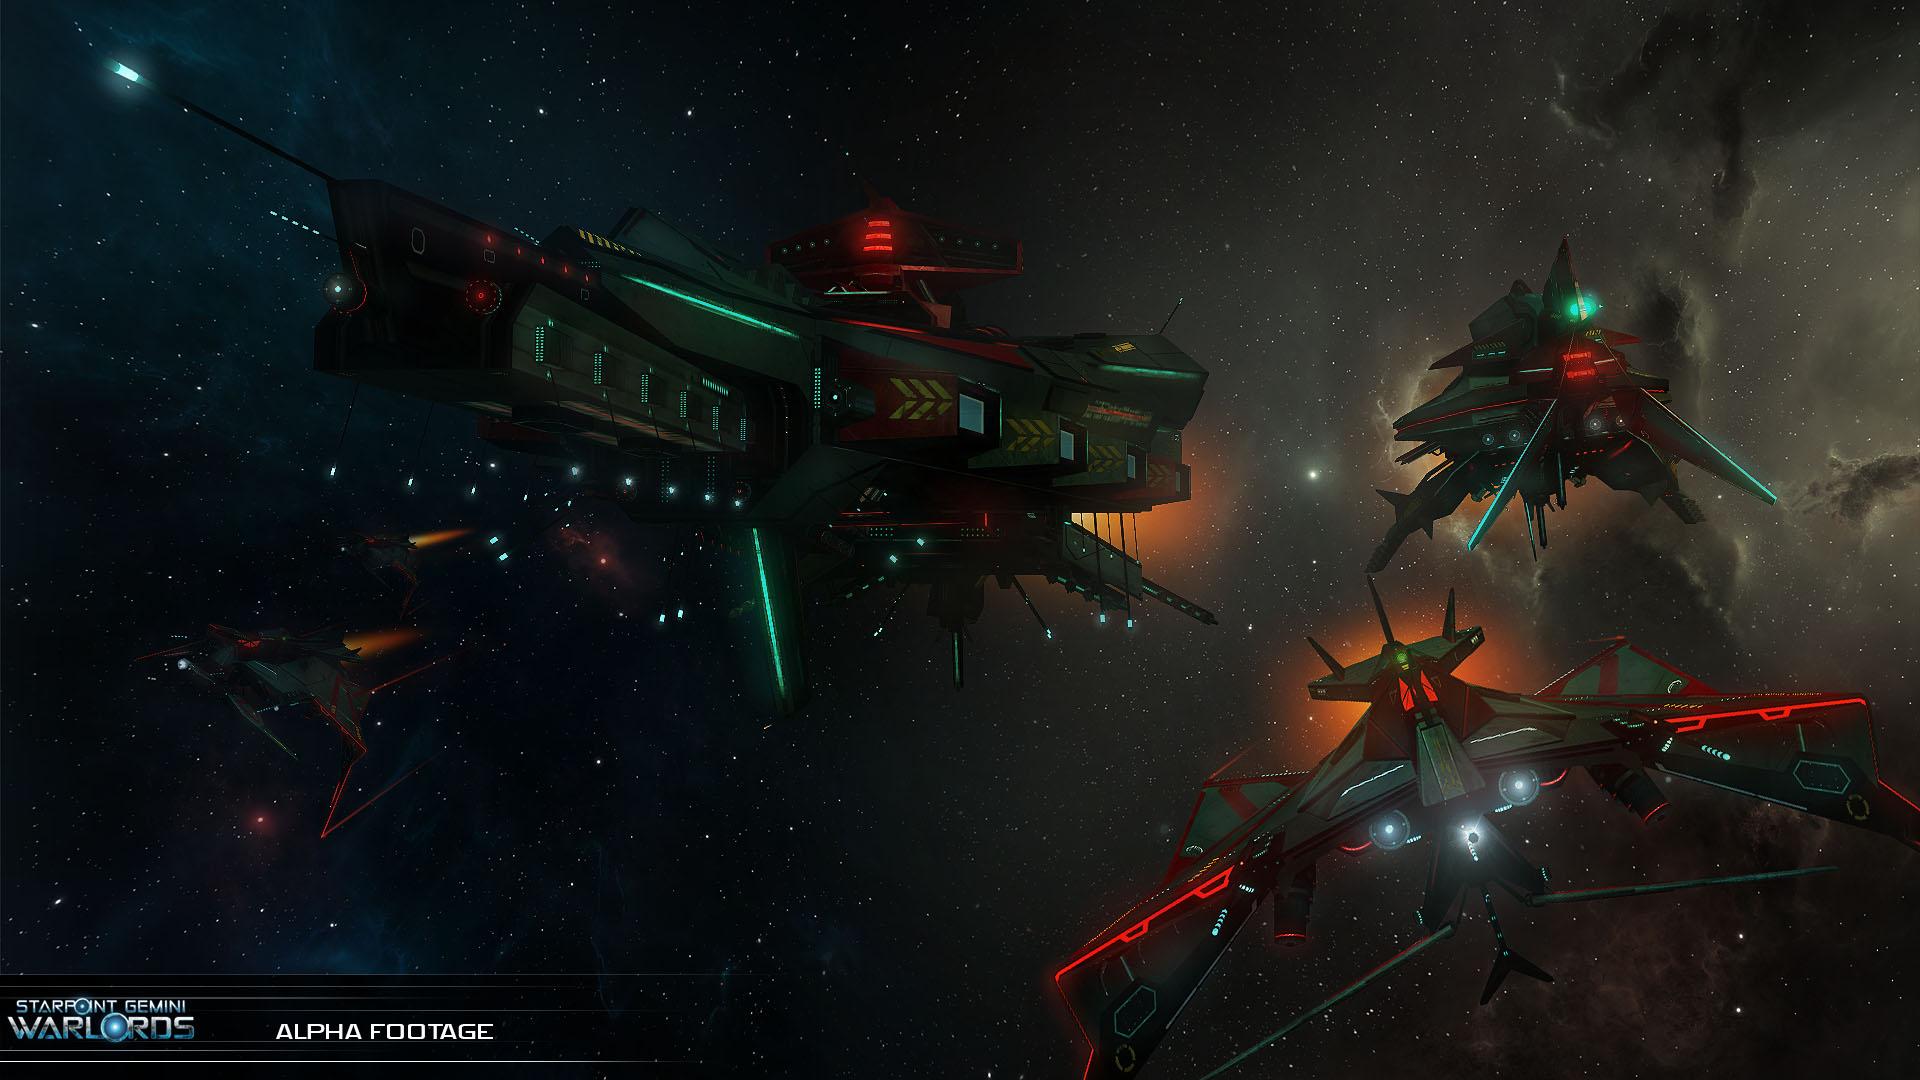 StarpointGemini Warlords 03